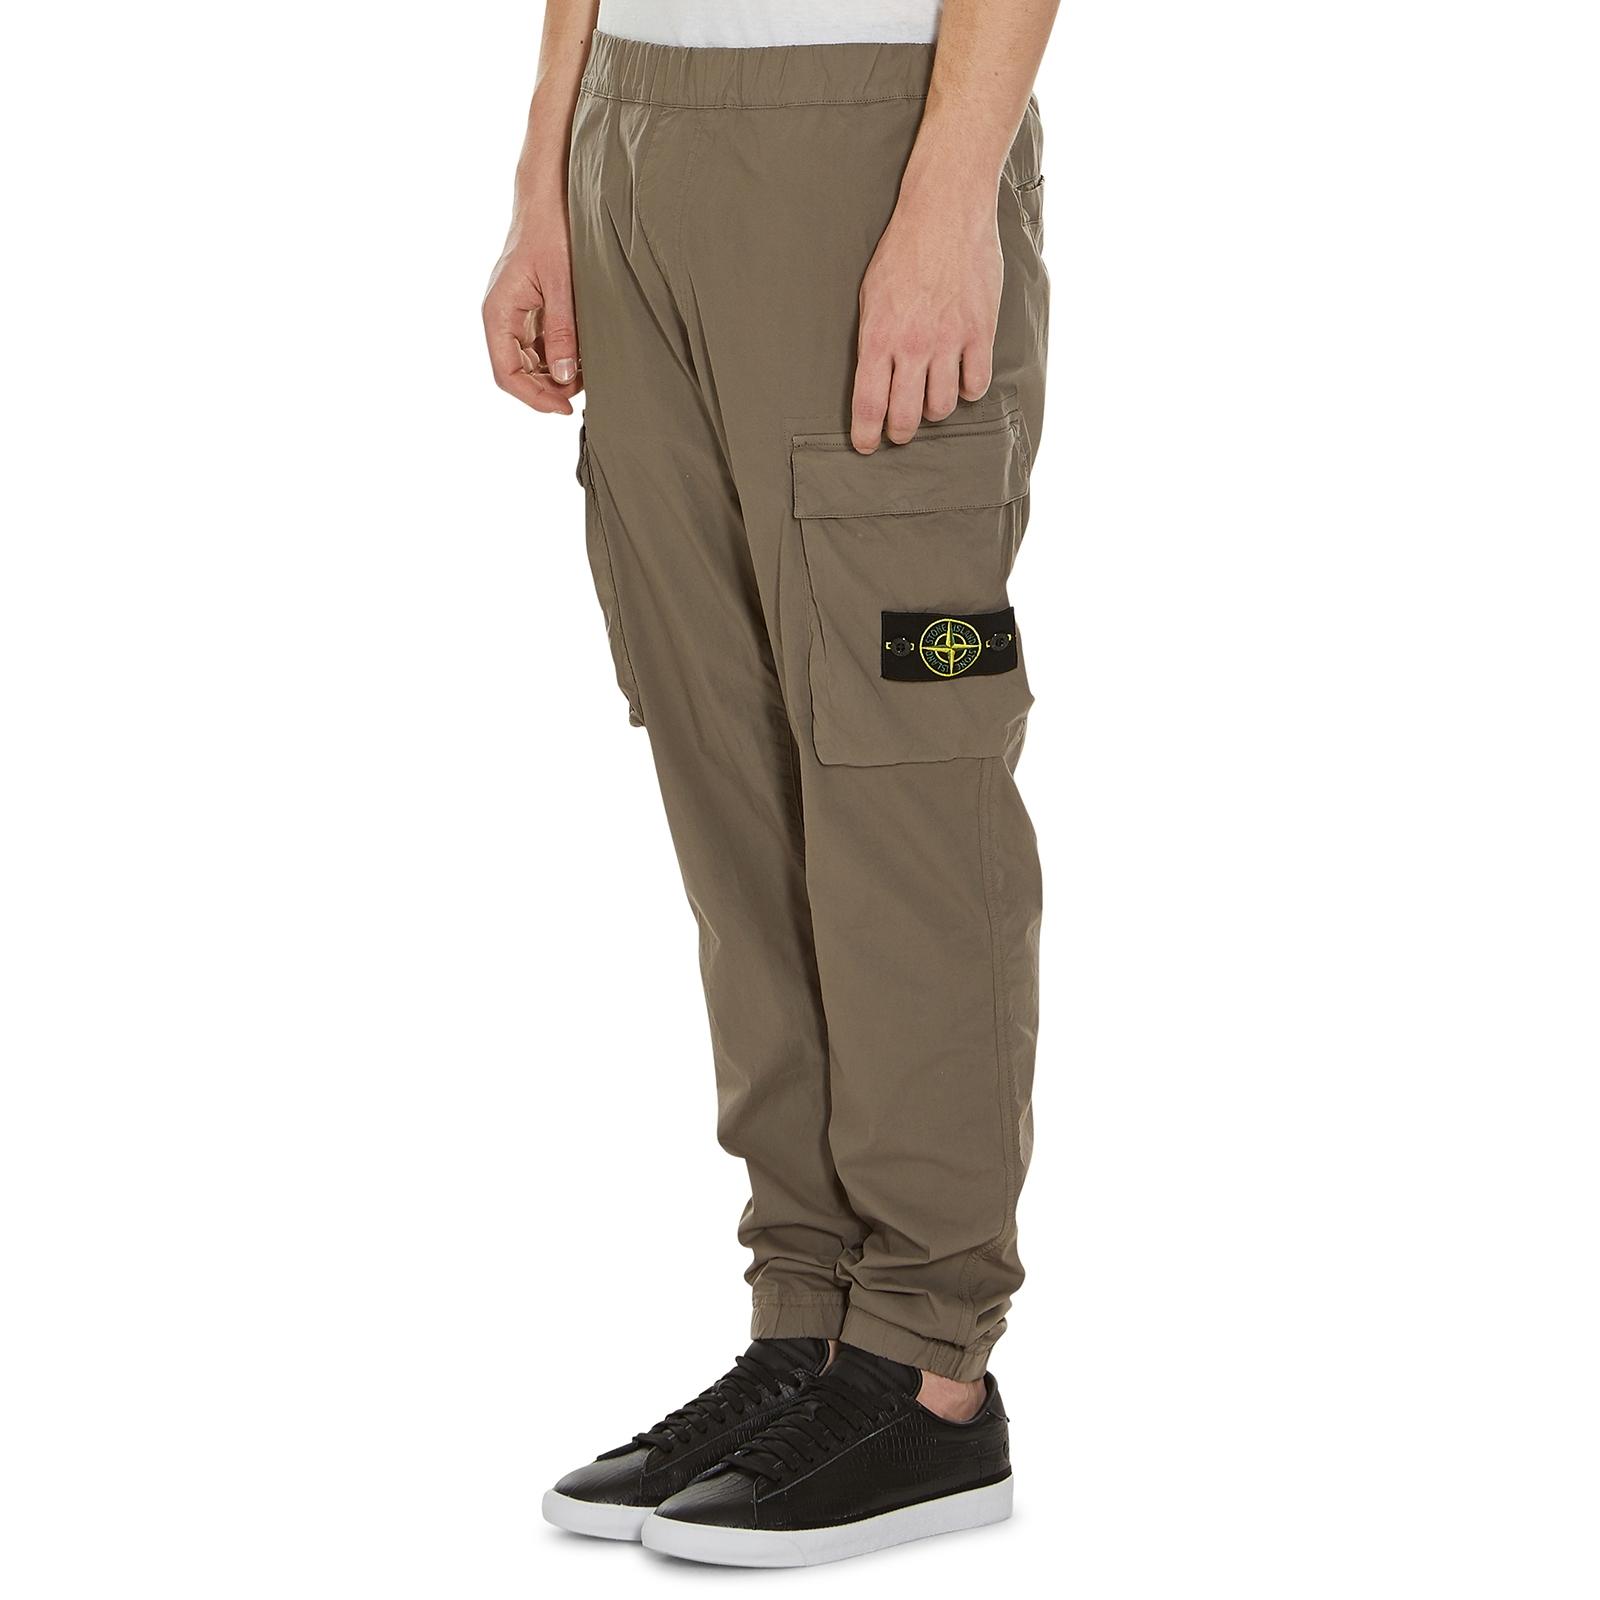 d54154a4c1 Very Goods | Stone Island Trousers Pants - Slam Jam Socialism